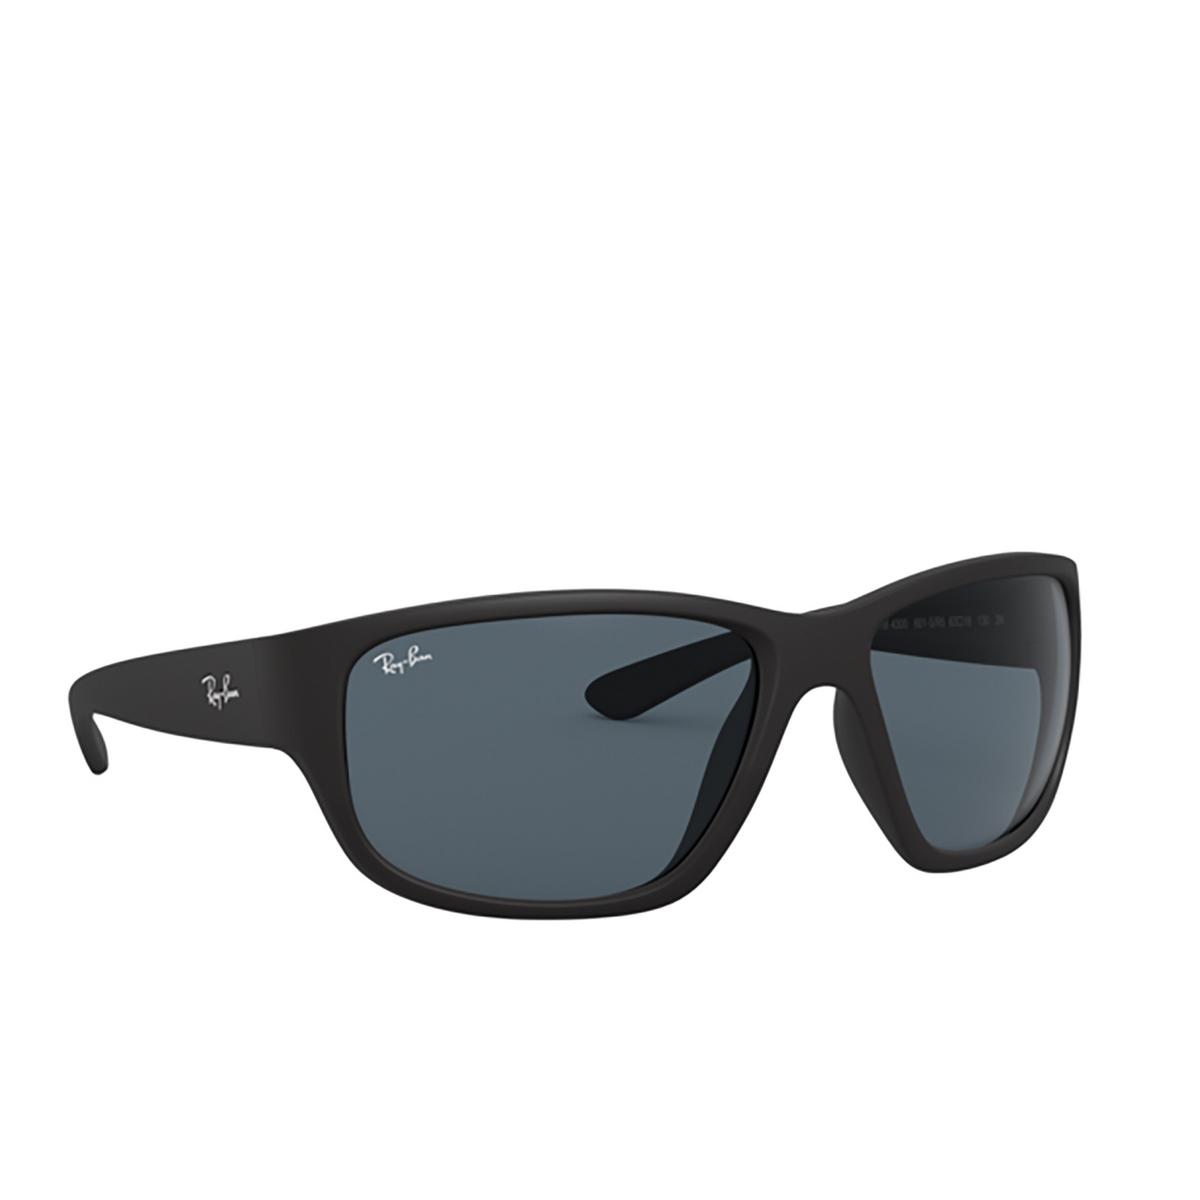 Ray-Ban® Square Sunglasses: RB4300 color Matte Black 601SR5 - 2/3.